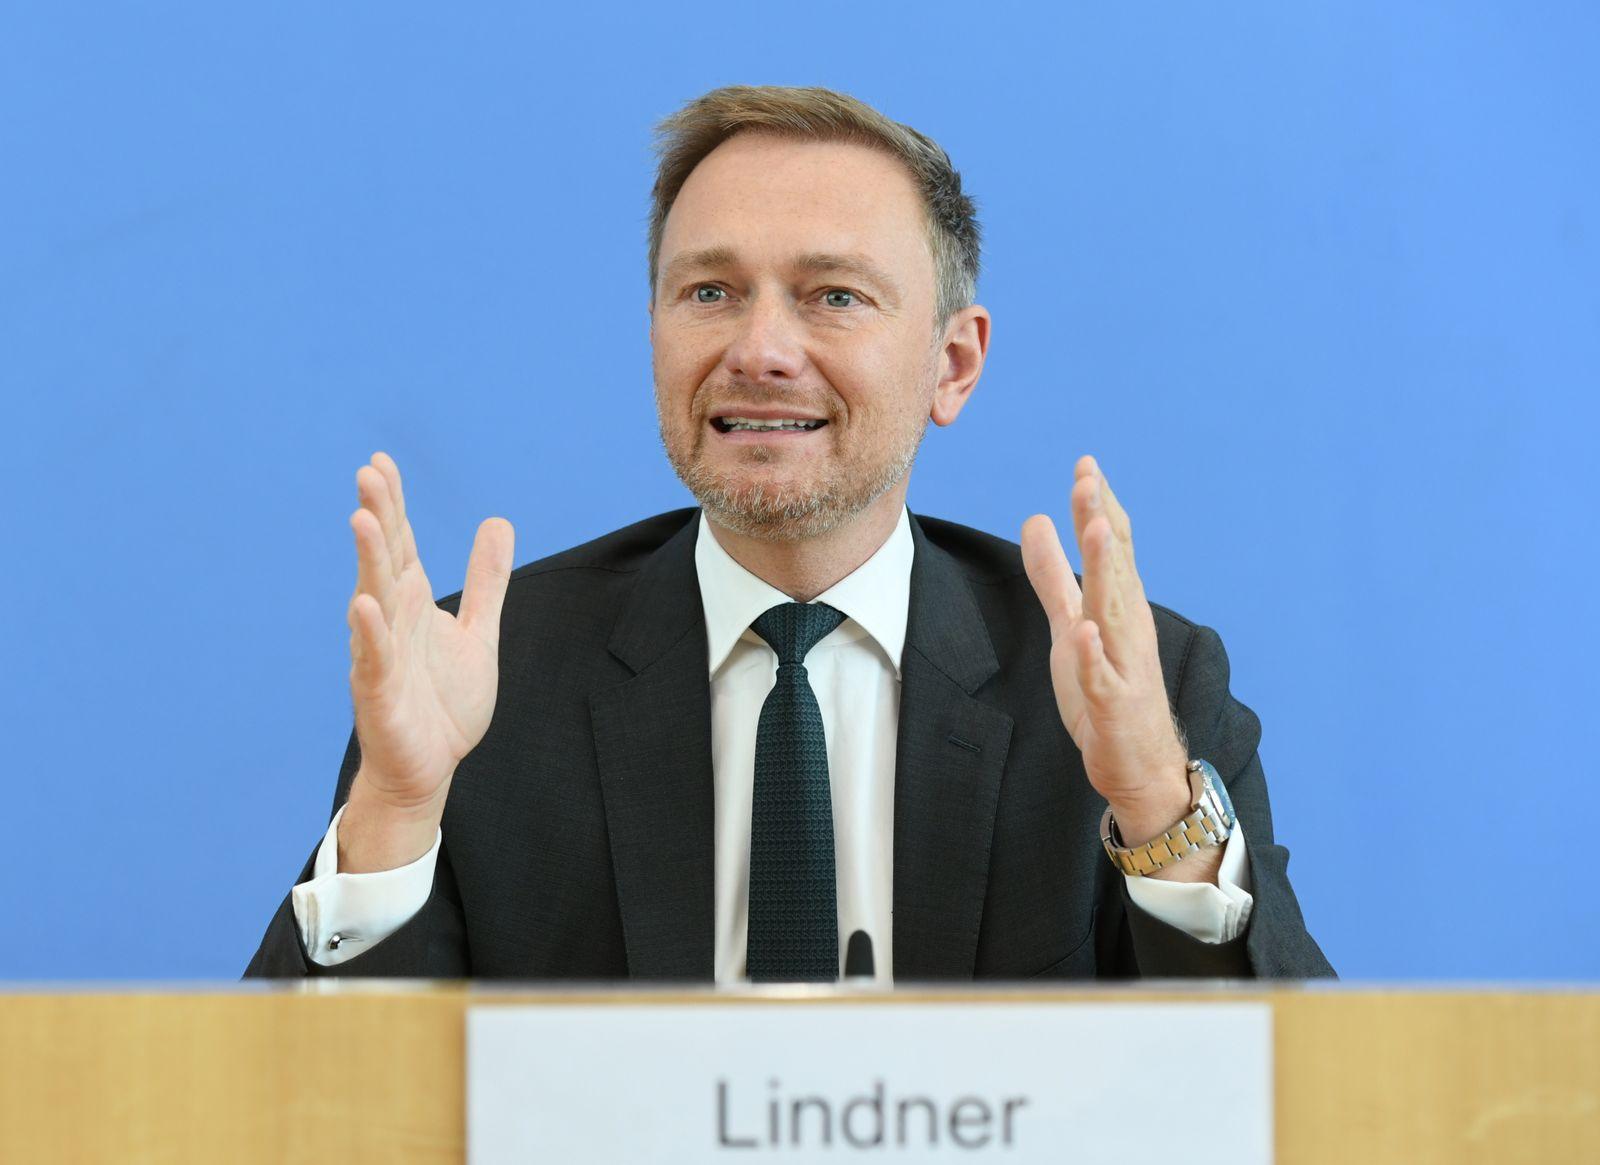 Christian Lindner/ 2019